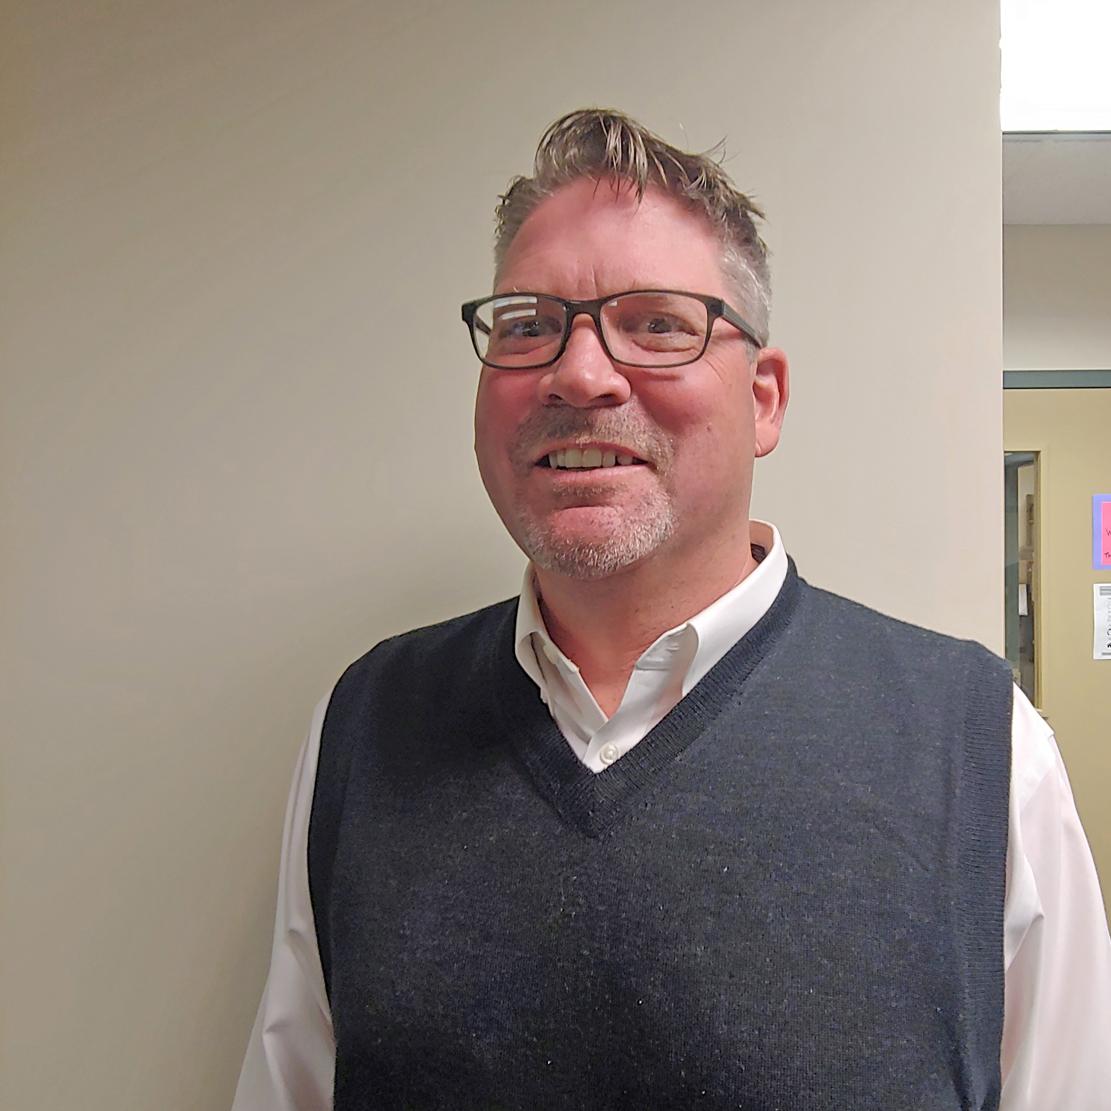 Employee Spotlight with Rick McEvoy